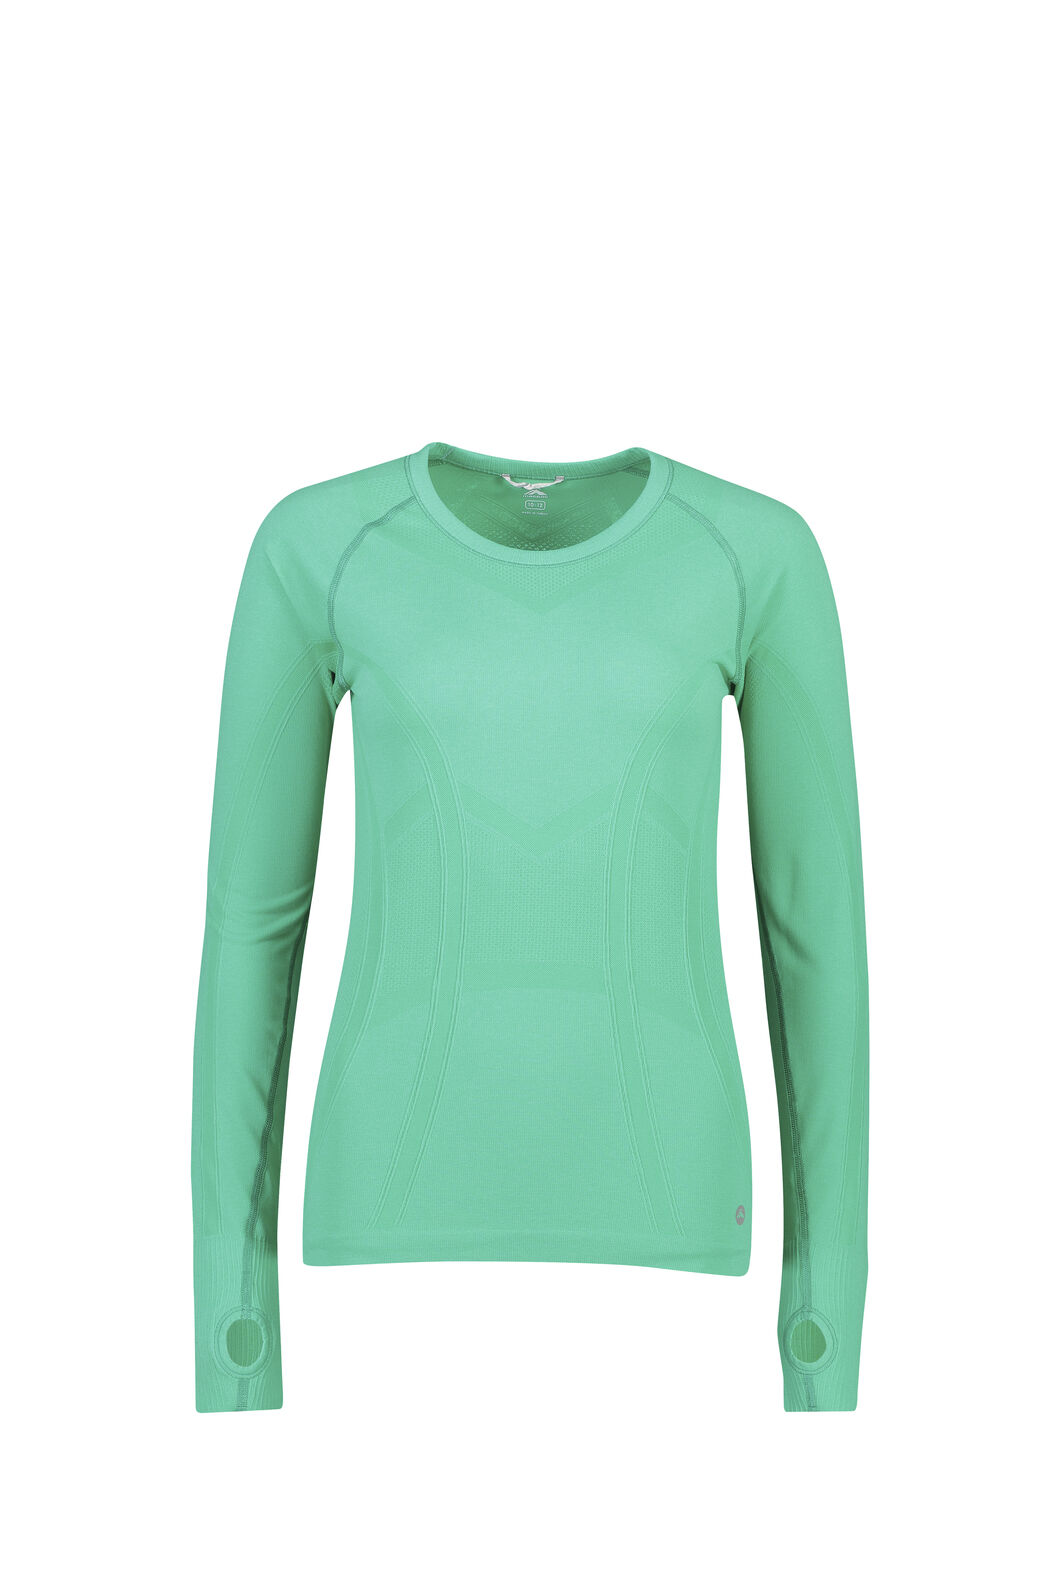 Macpac Limitless Long Sleeve Tee - Women's, Deep Green, hi-res